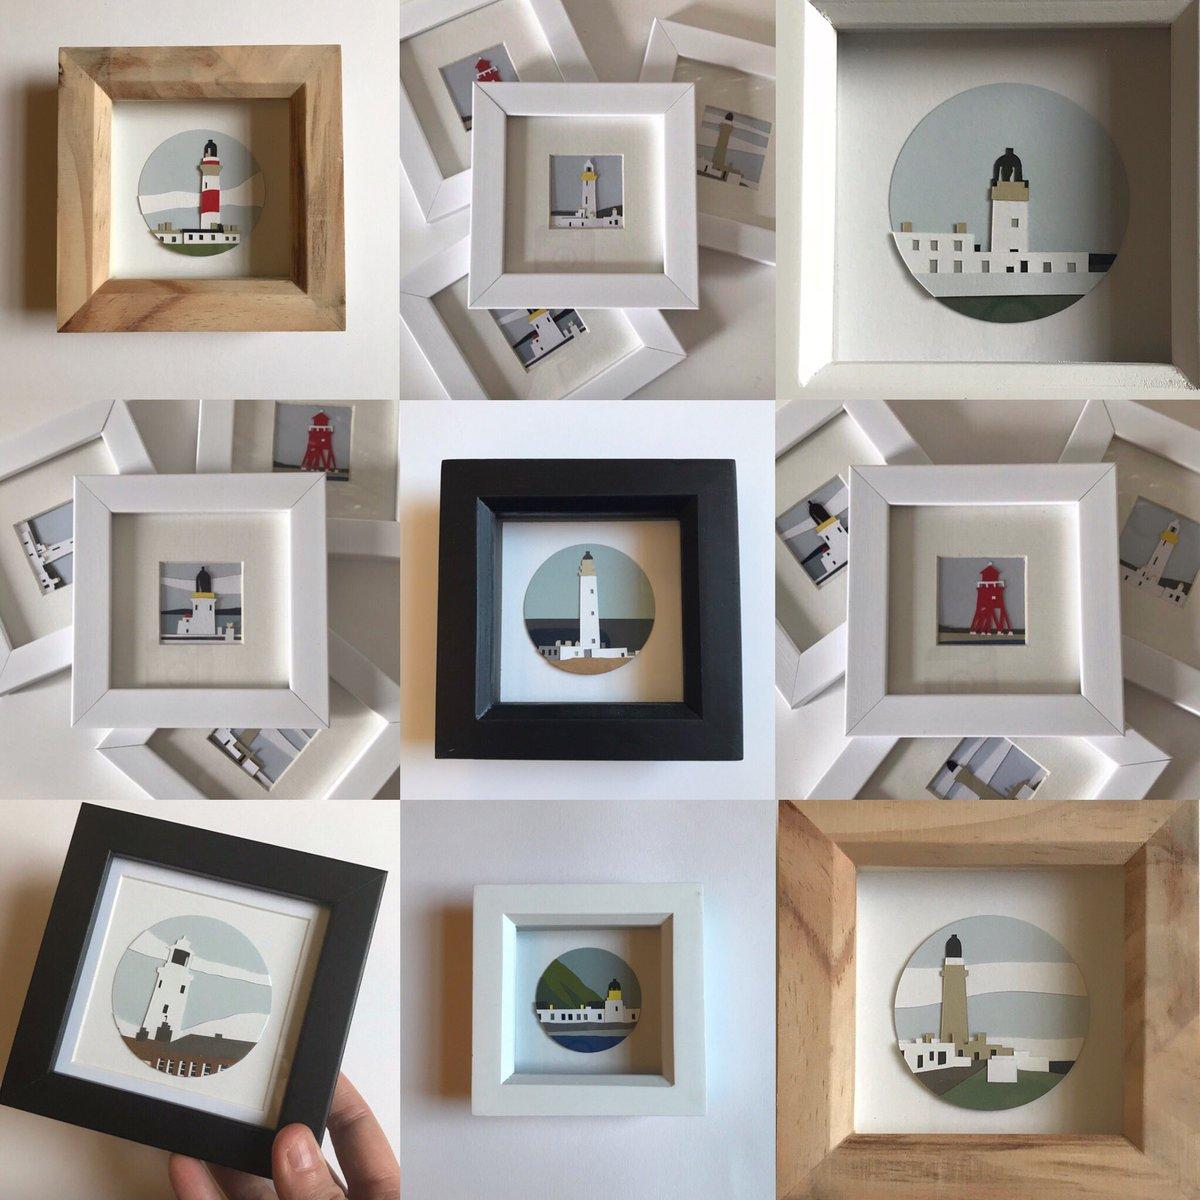 Last day to catch my Lighthouse♥️ SALE - check them out in shop !! #artists #designer #design #DesignThinking #paper #papercraft #papercut #paperart #lighthouse #sea #coast #miniature #architectural #etsyshop #EtsySeller #sea